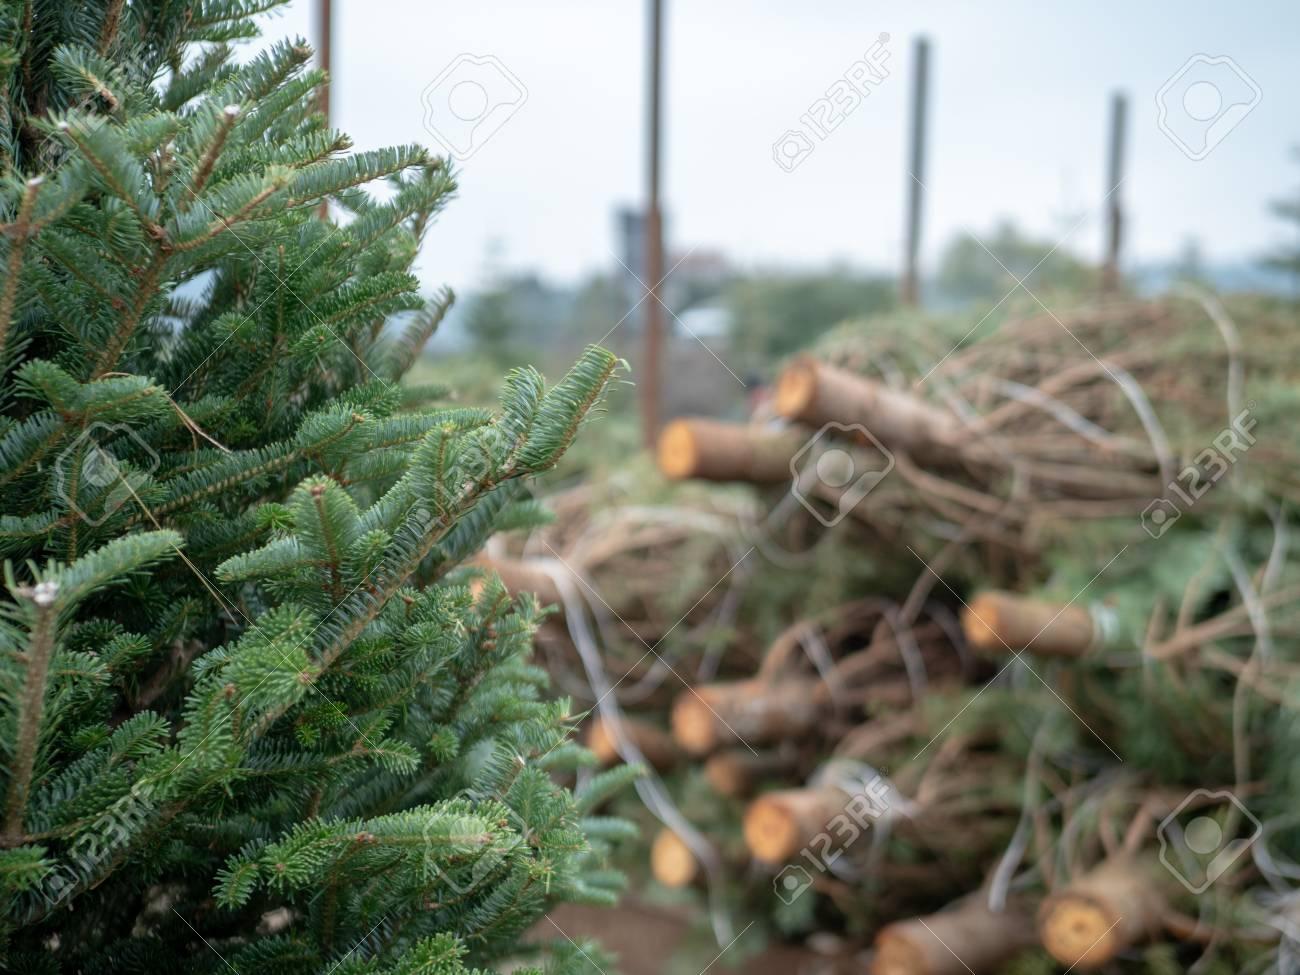 Douglas Fir Christmas Tree.Stack Of Medium Sized Douglas Fir Christmas Trees Cut Down And